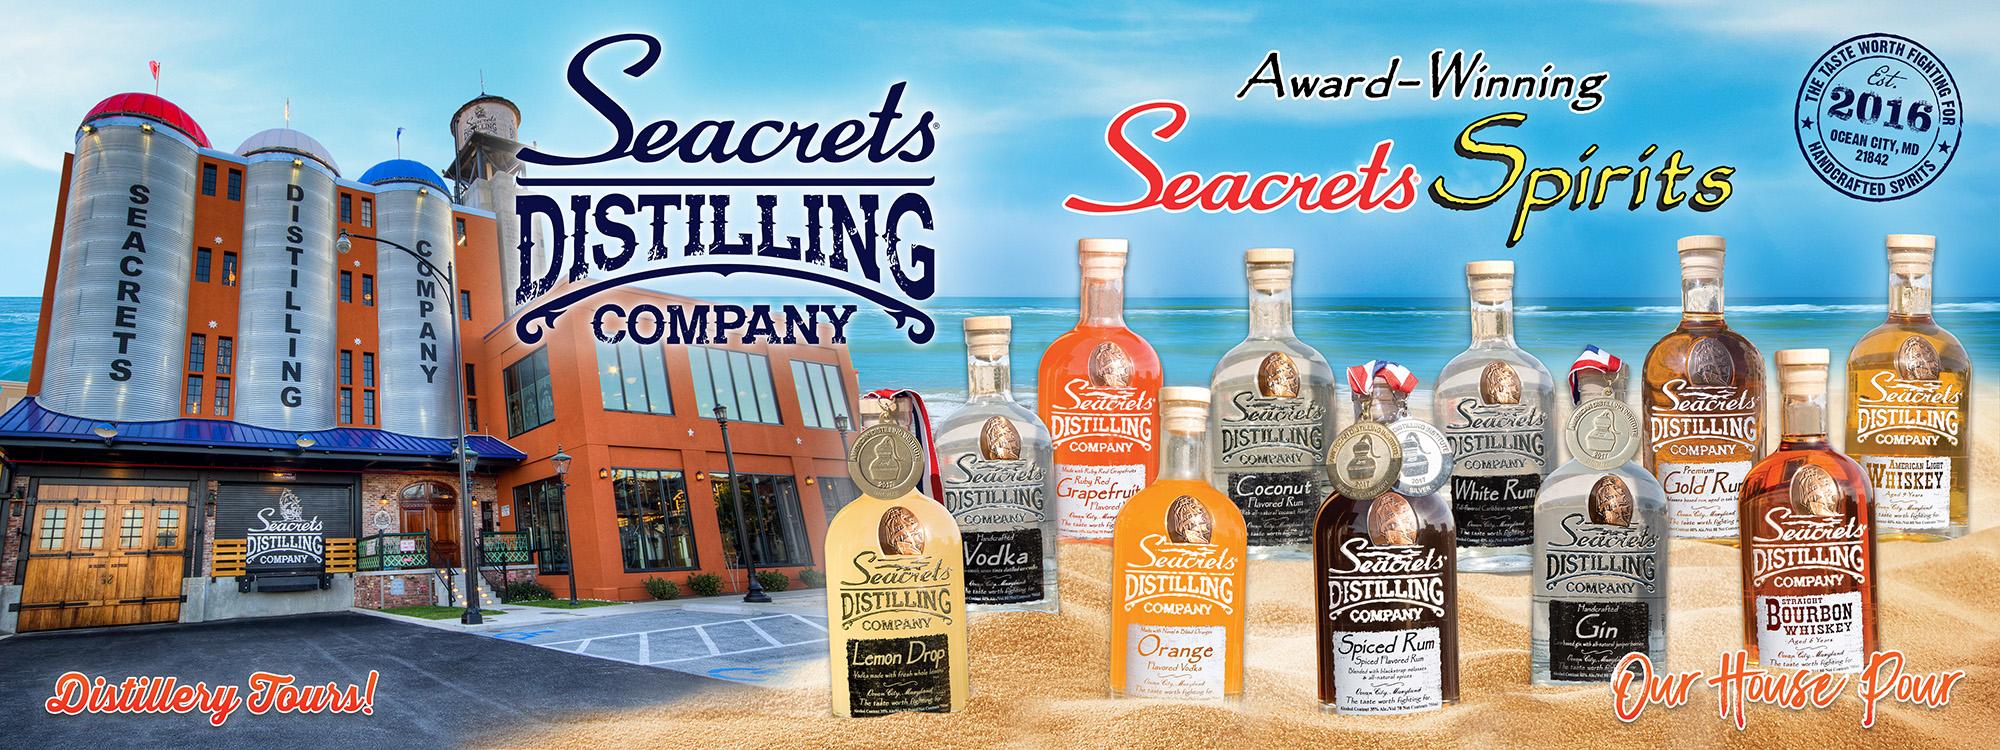 Seacrets Distilling Company Banner